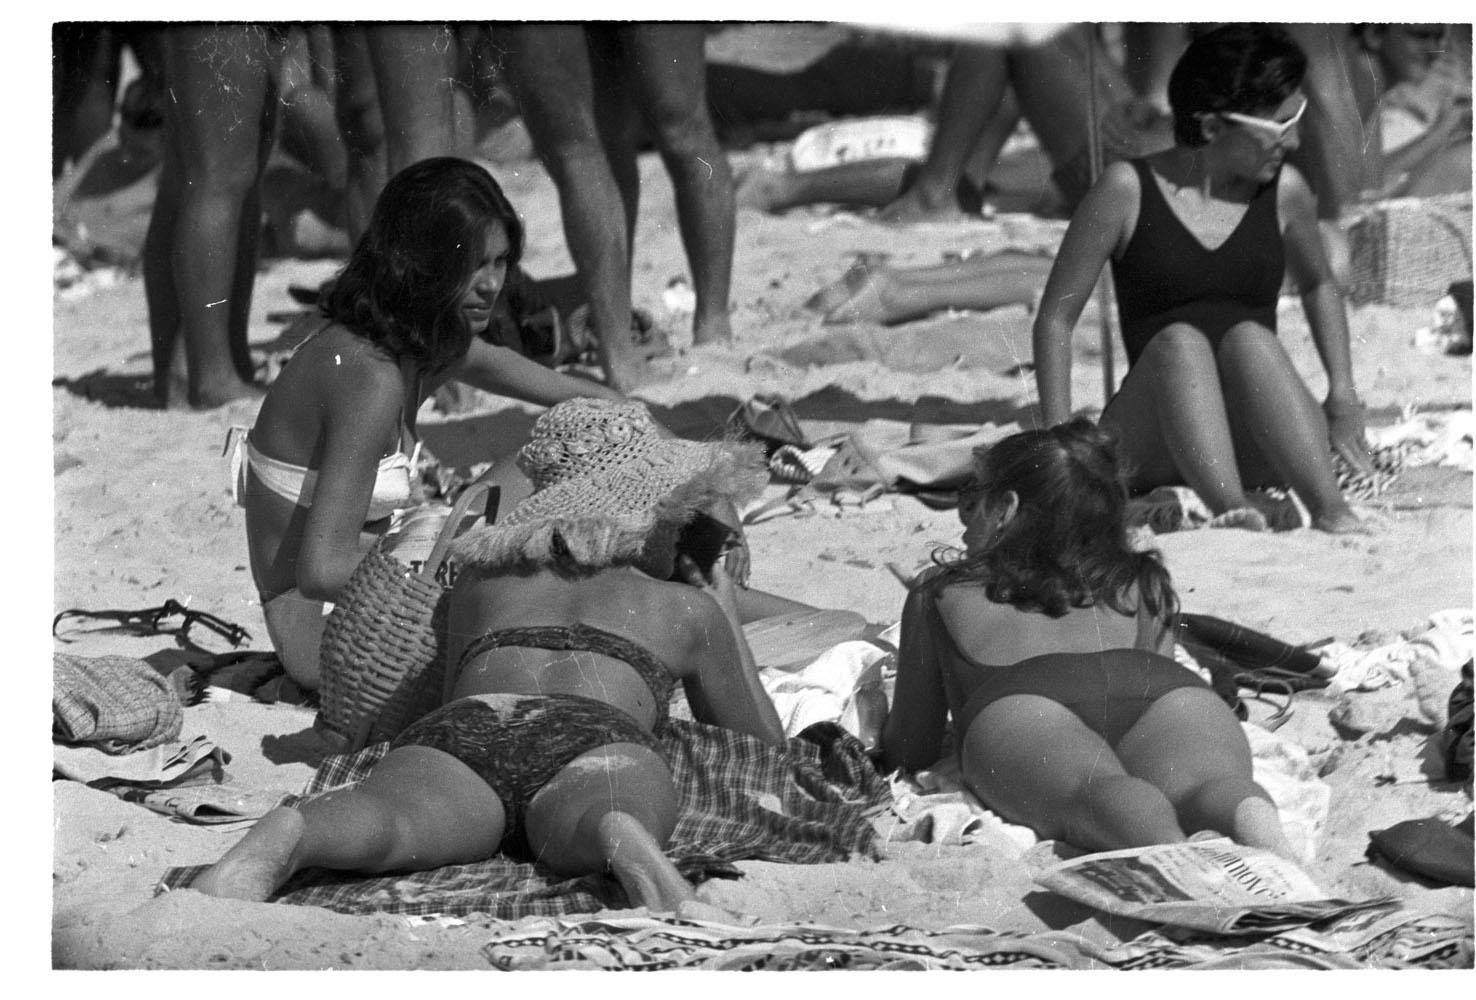 Moda praia nas areias do Rio de Janeiro  RIO-ANTIGO-04